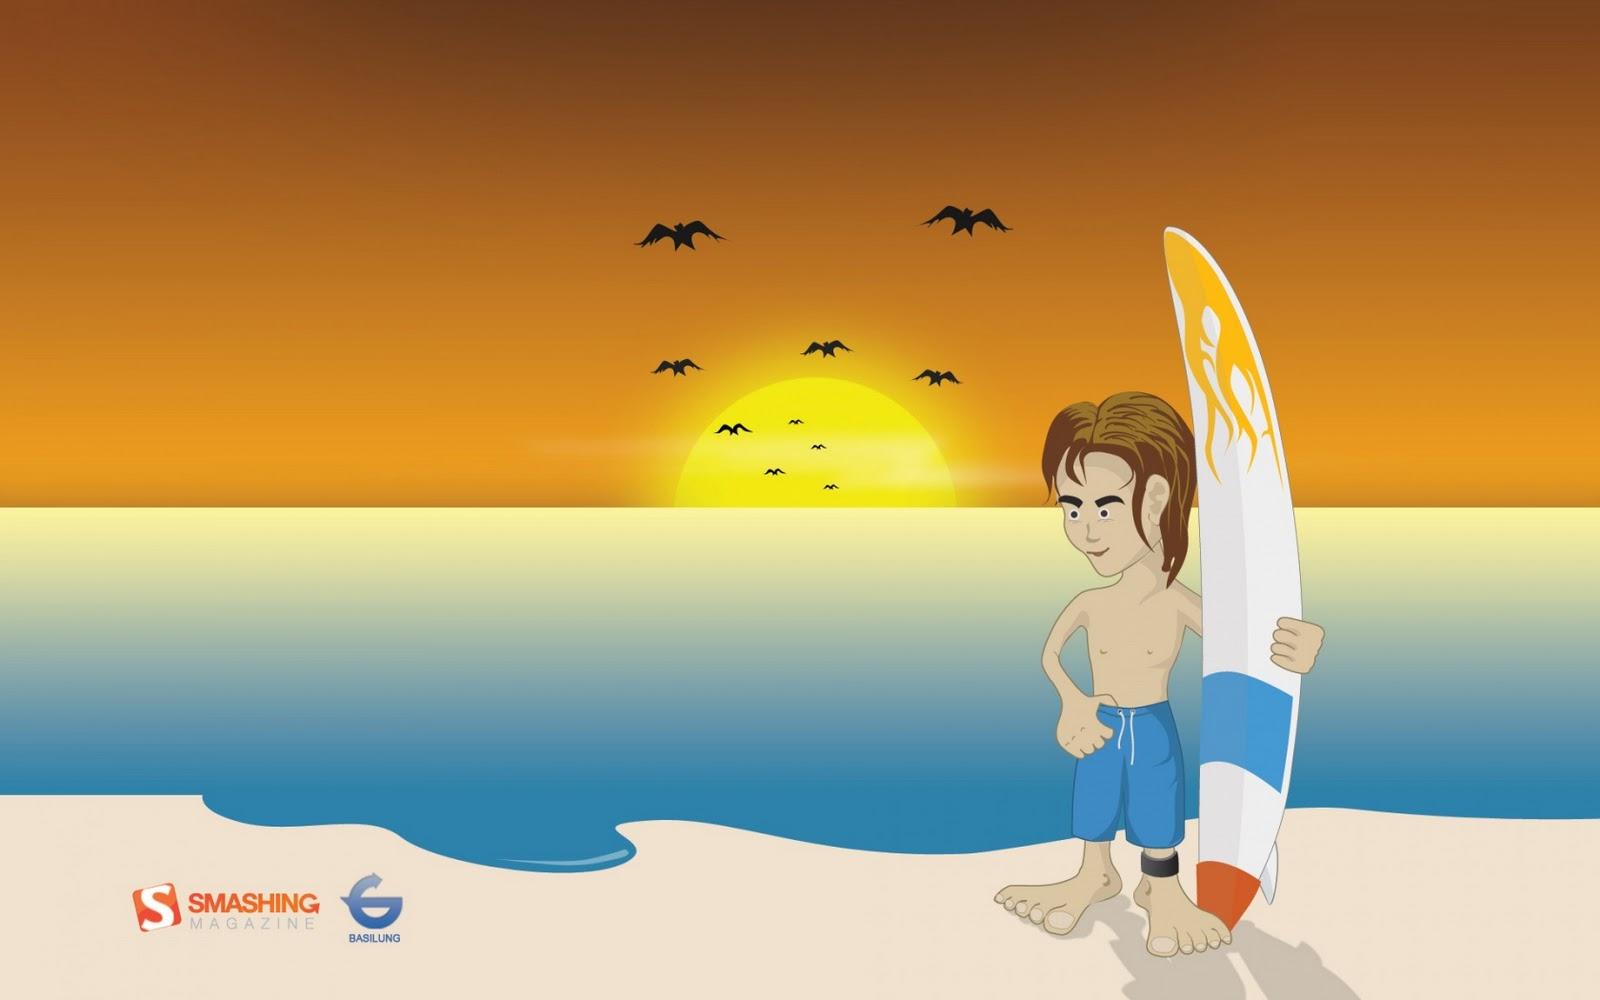 http://1.bp.blogspot.com/_RAlP3BmEW1Q/TQX4Fbw11wI/AAAAAAAACOk/jijy4oRt1zo/s1600/The-best-top-summer-desktop-wallpapers-24.jpg